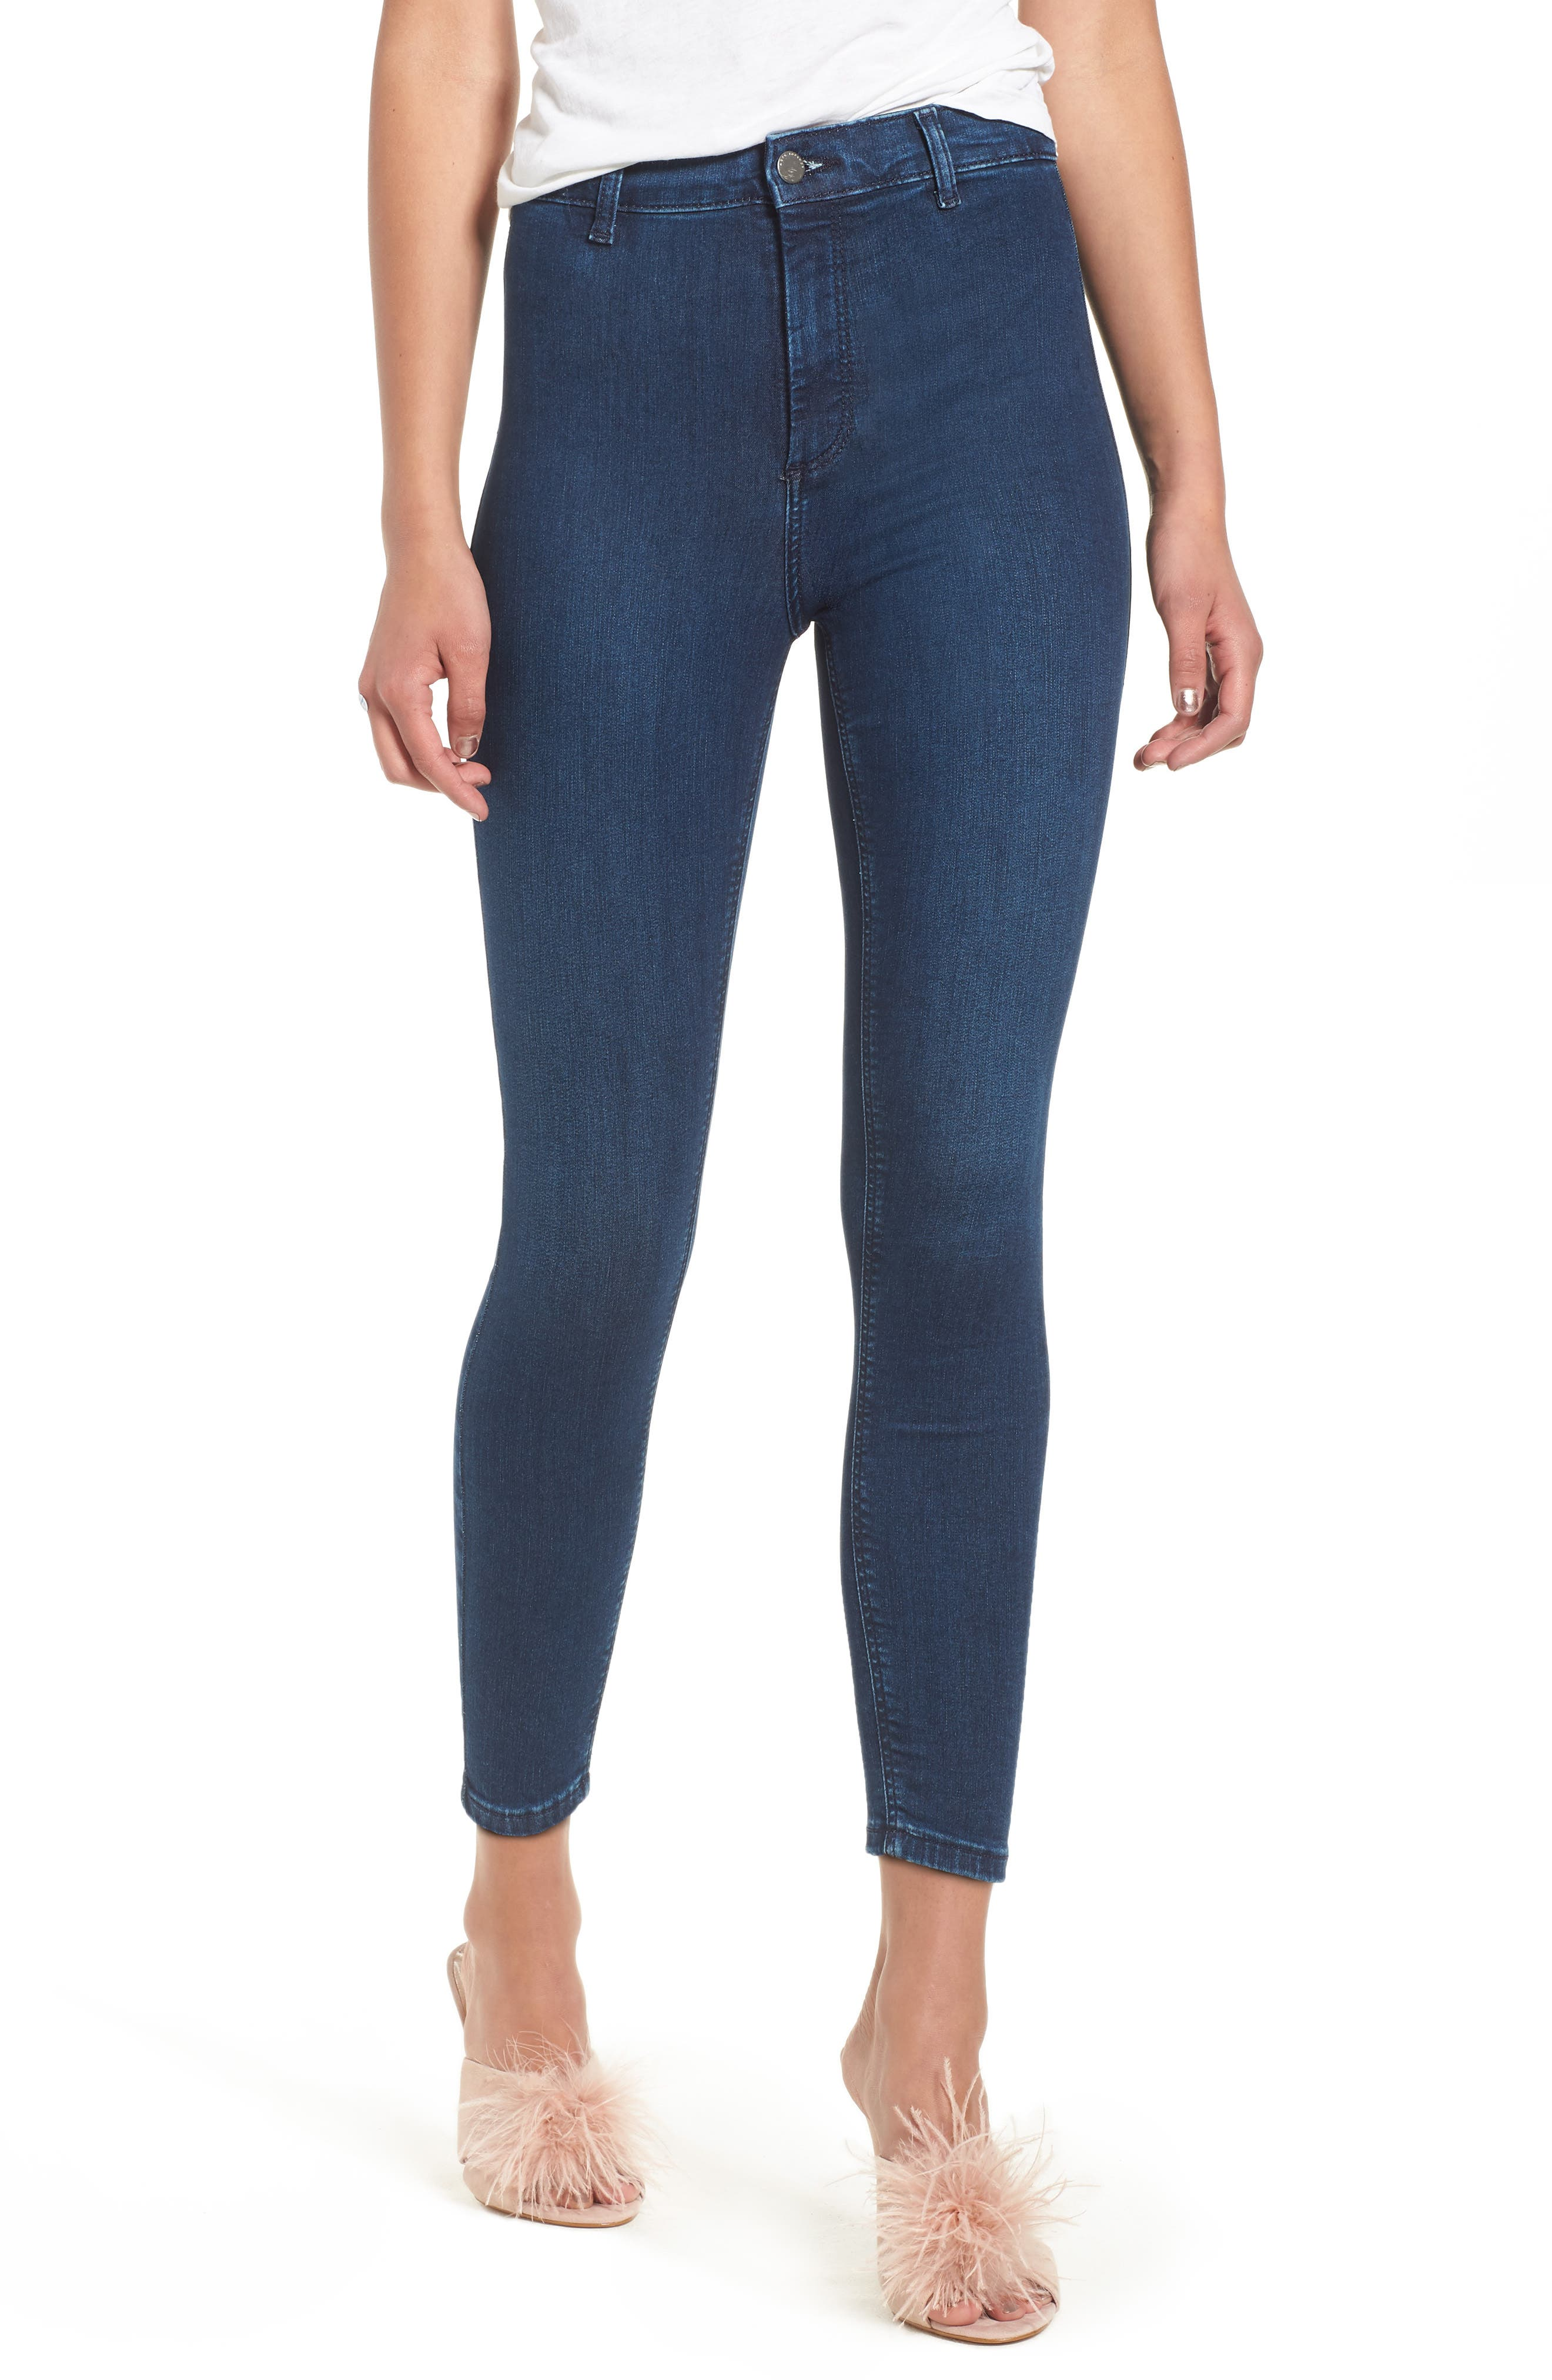 Moto Joni Indigo Jeans,                         Main,                         color, 400